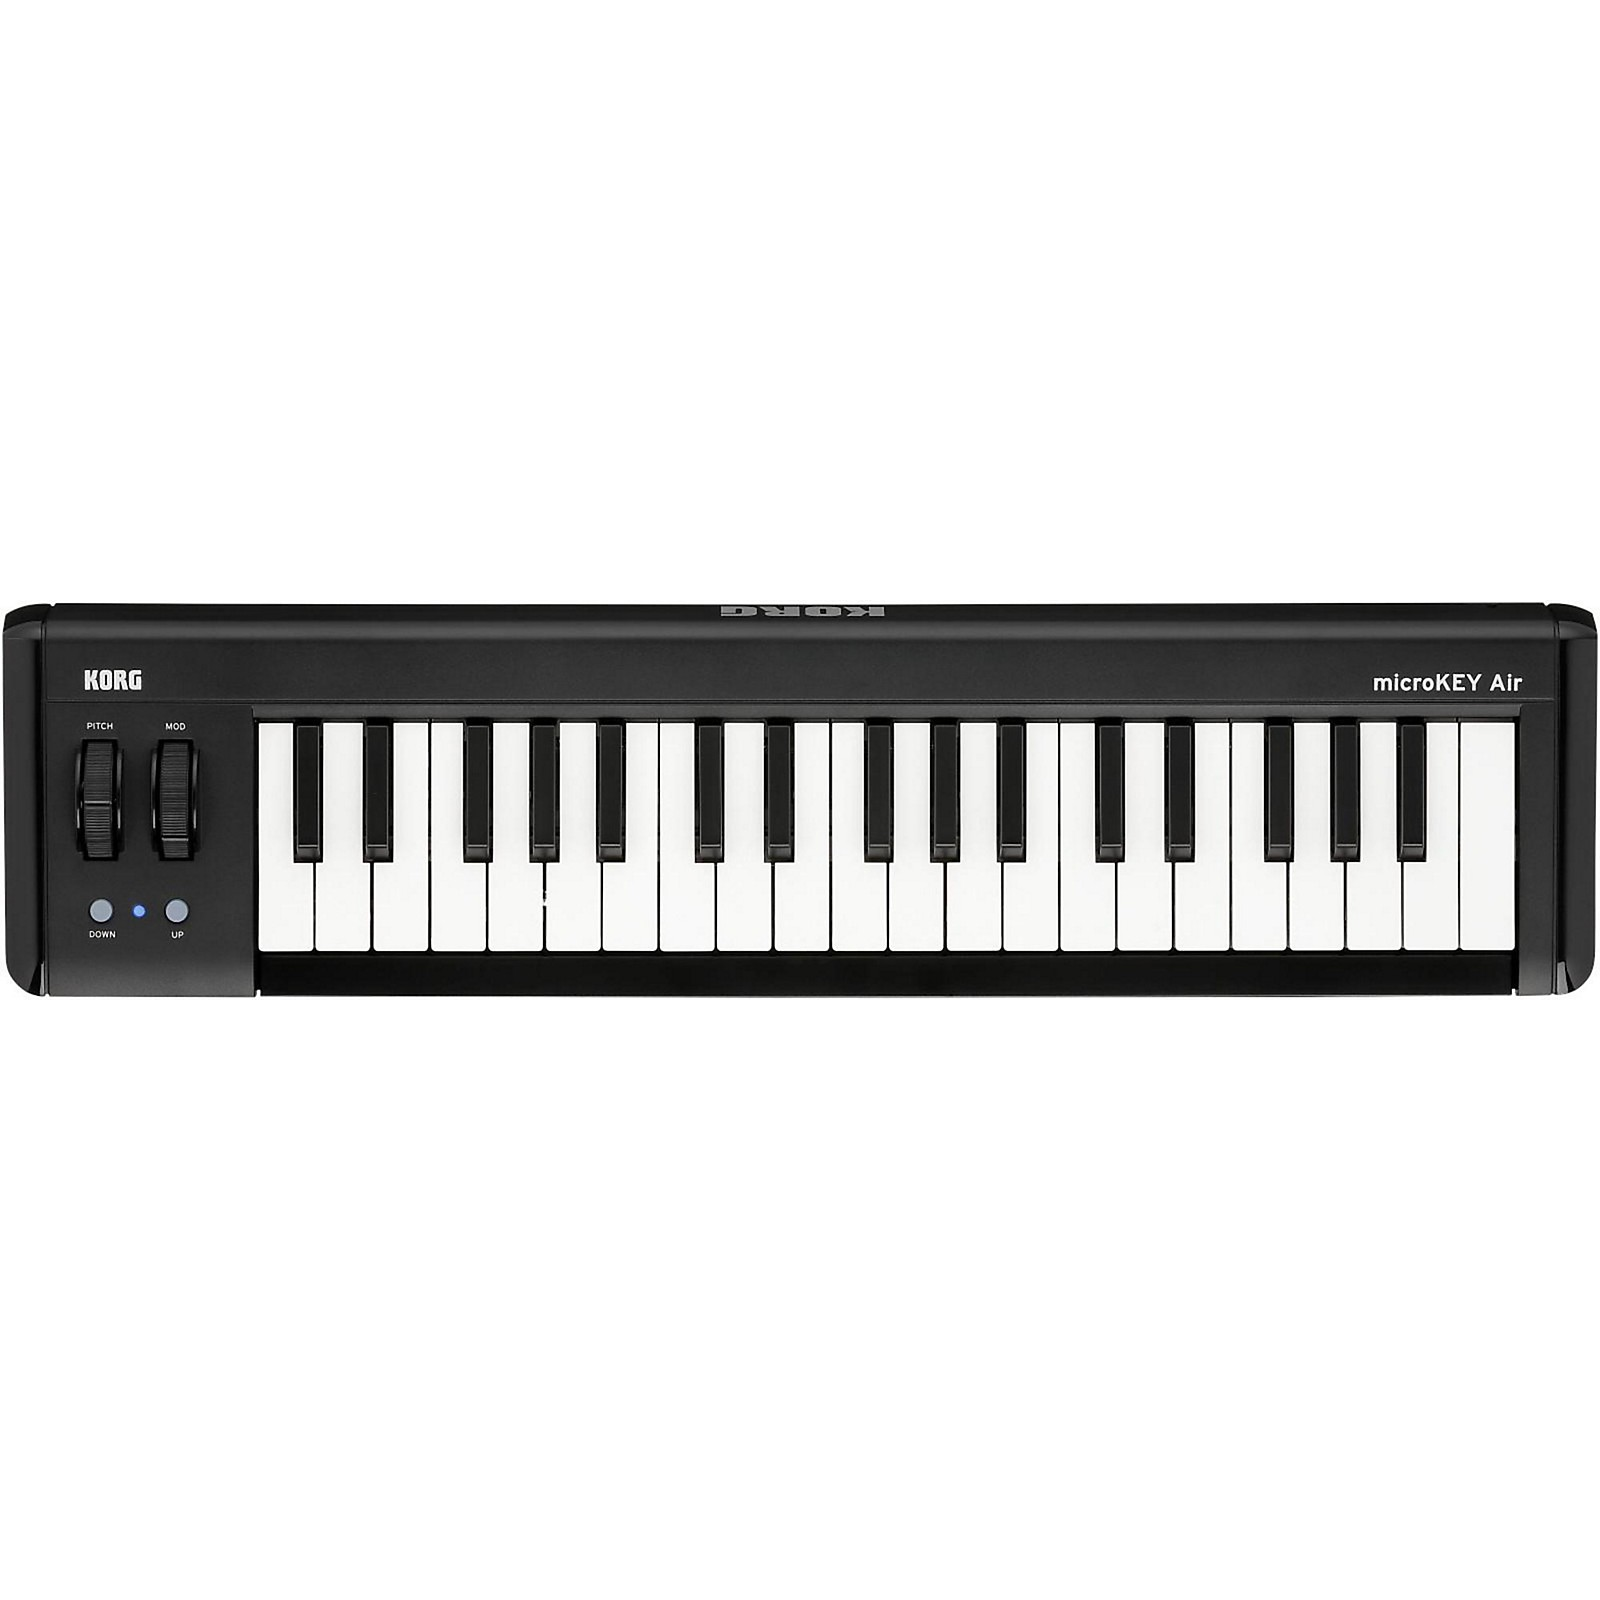 Open Box Korg microKEY Air 37-Key Bluetooth MIDI Controller